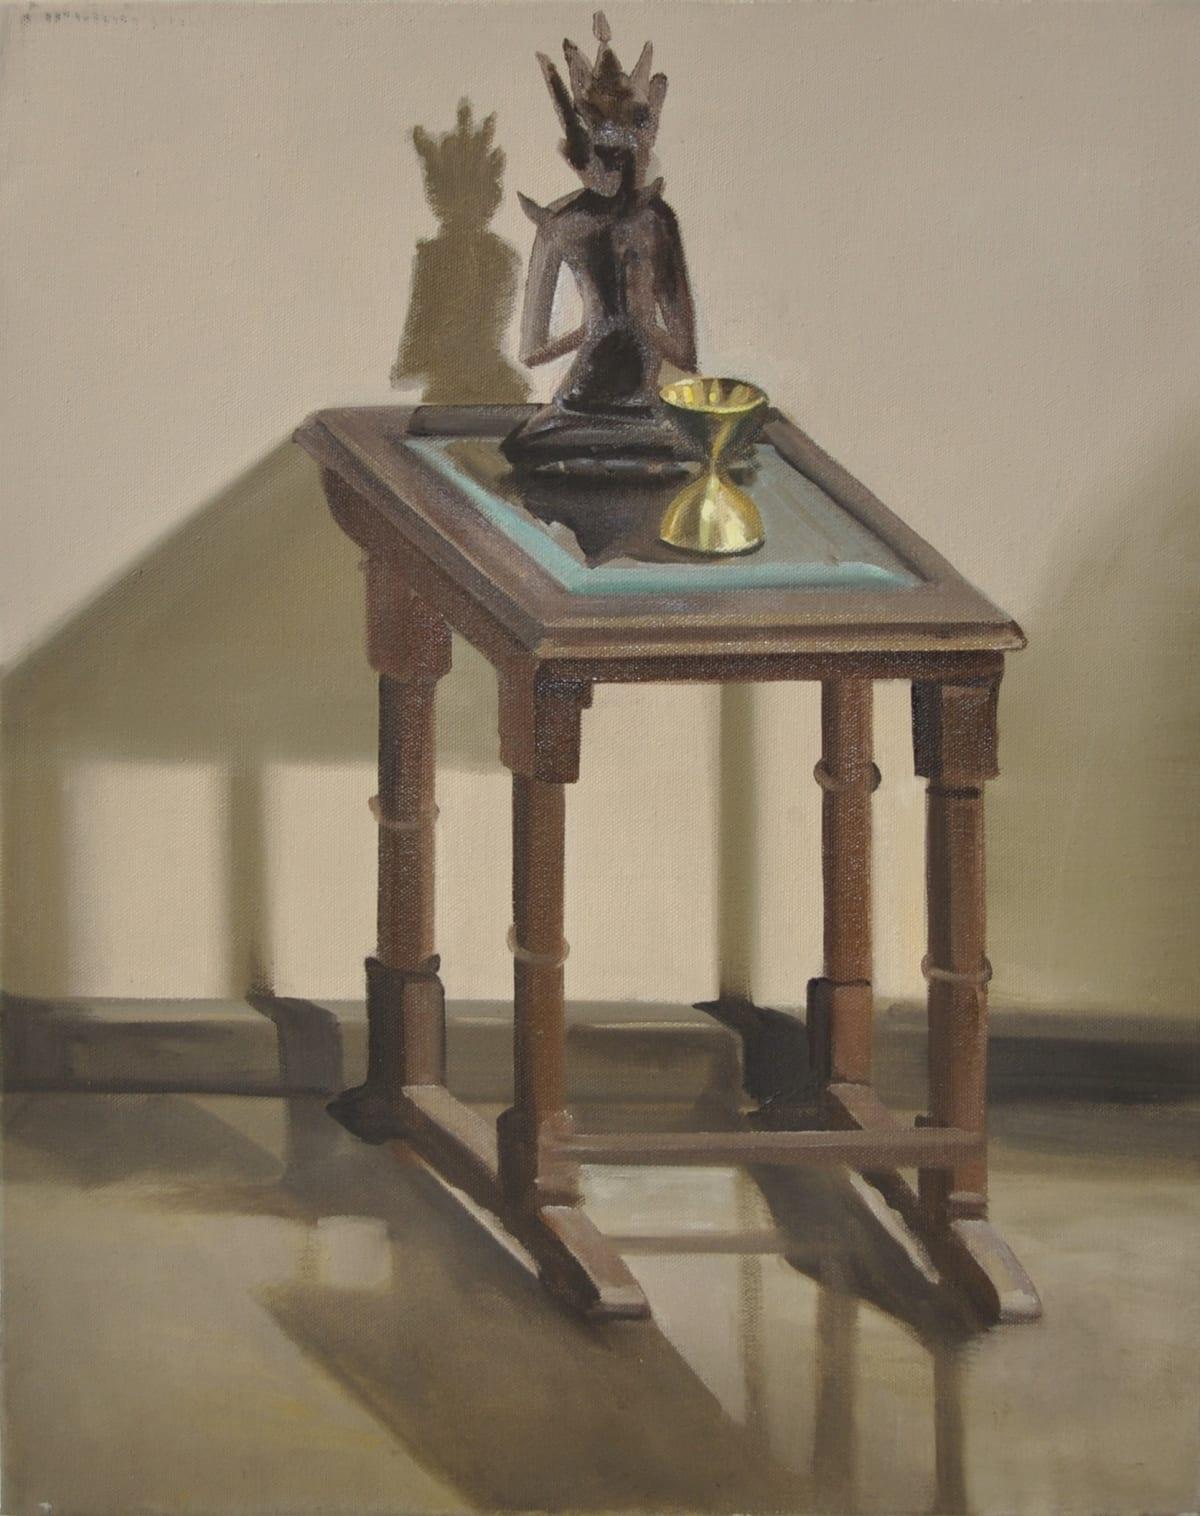 Shibu Natesan b. 1966Subramania Bharati, 2015 Oil on canvas 51 x 40 cm 20 1/8 x 15 3/4 in